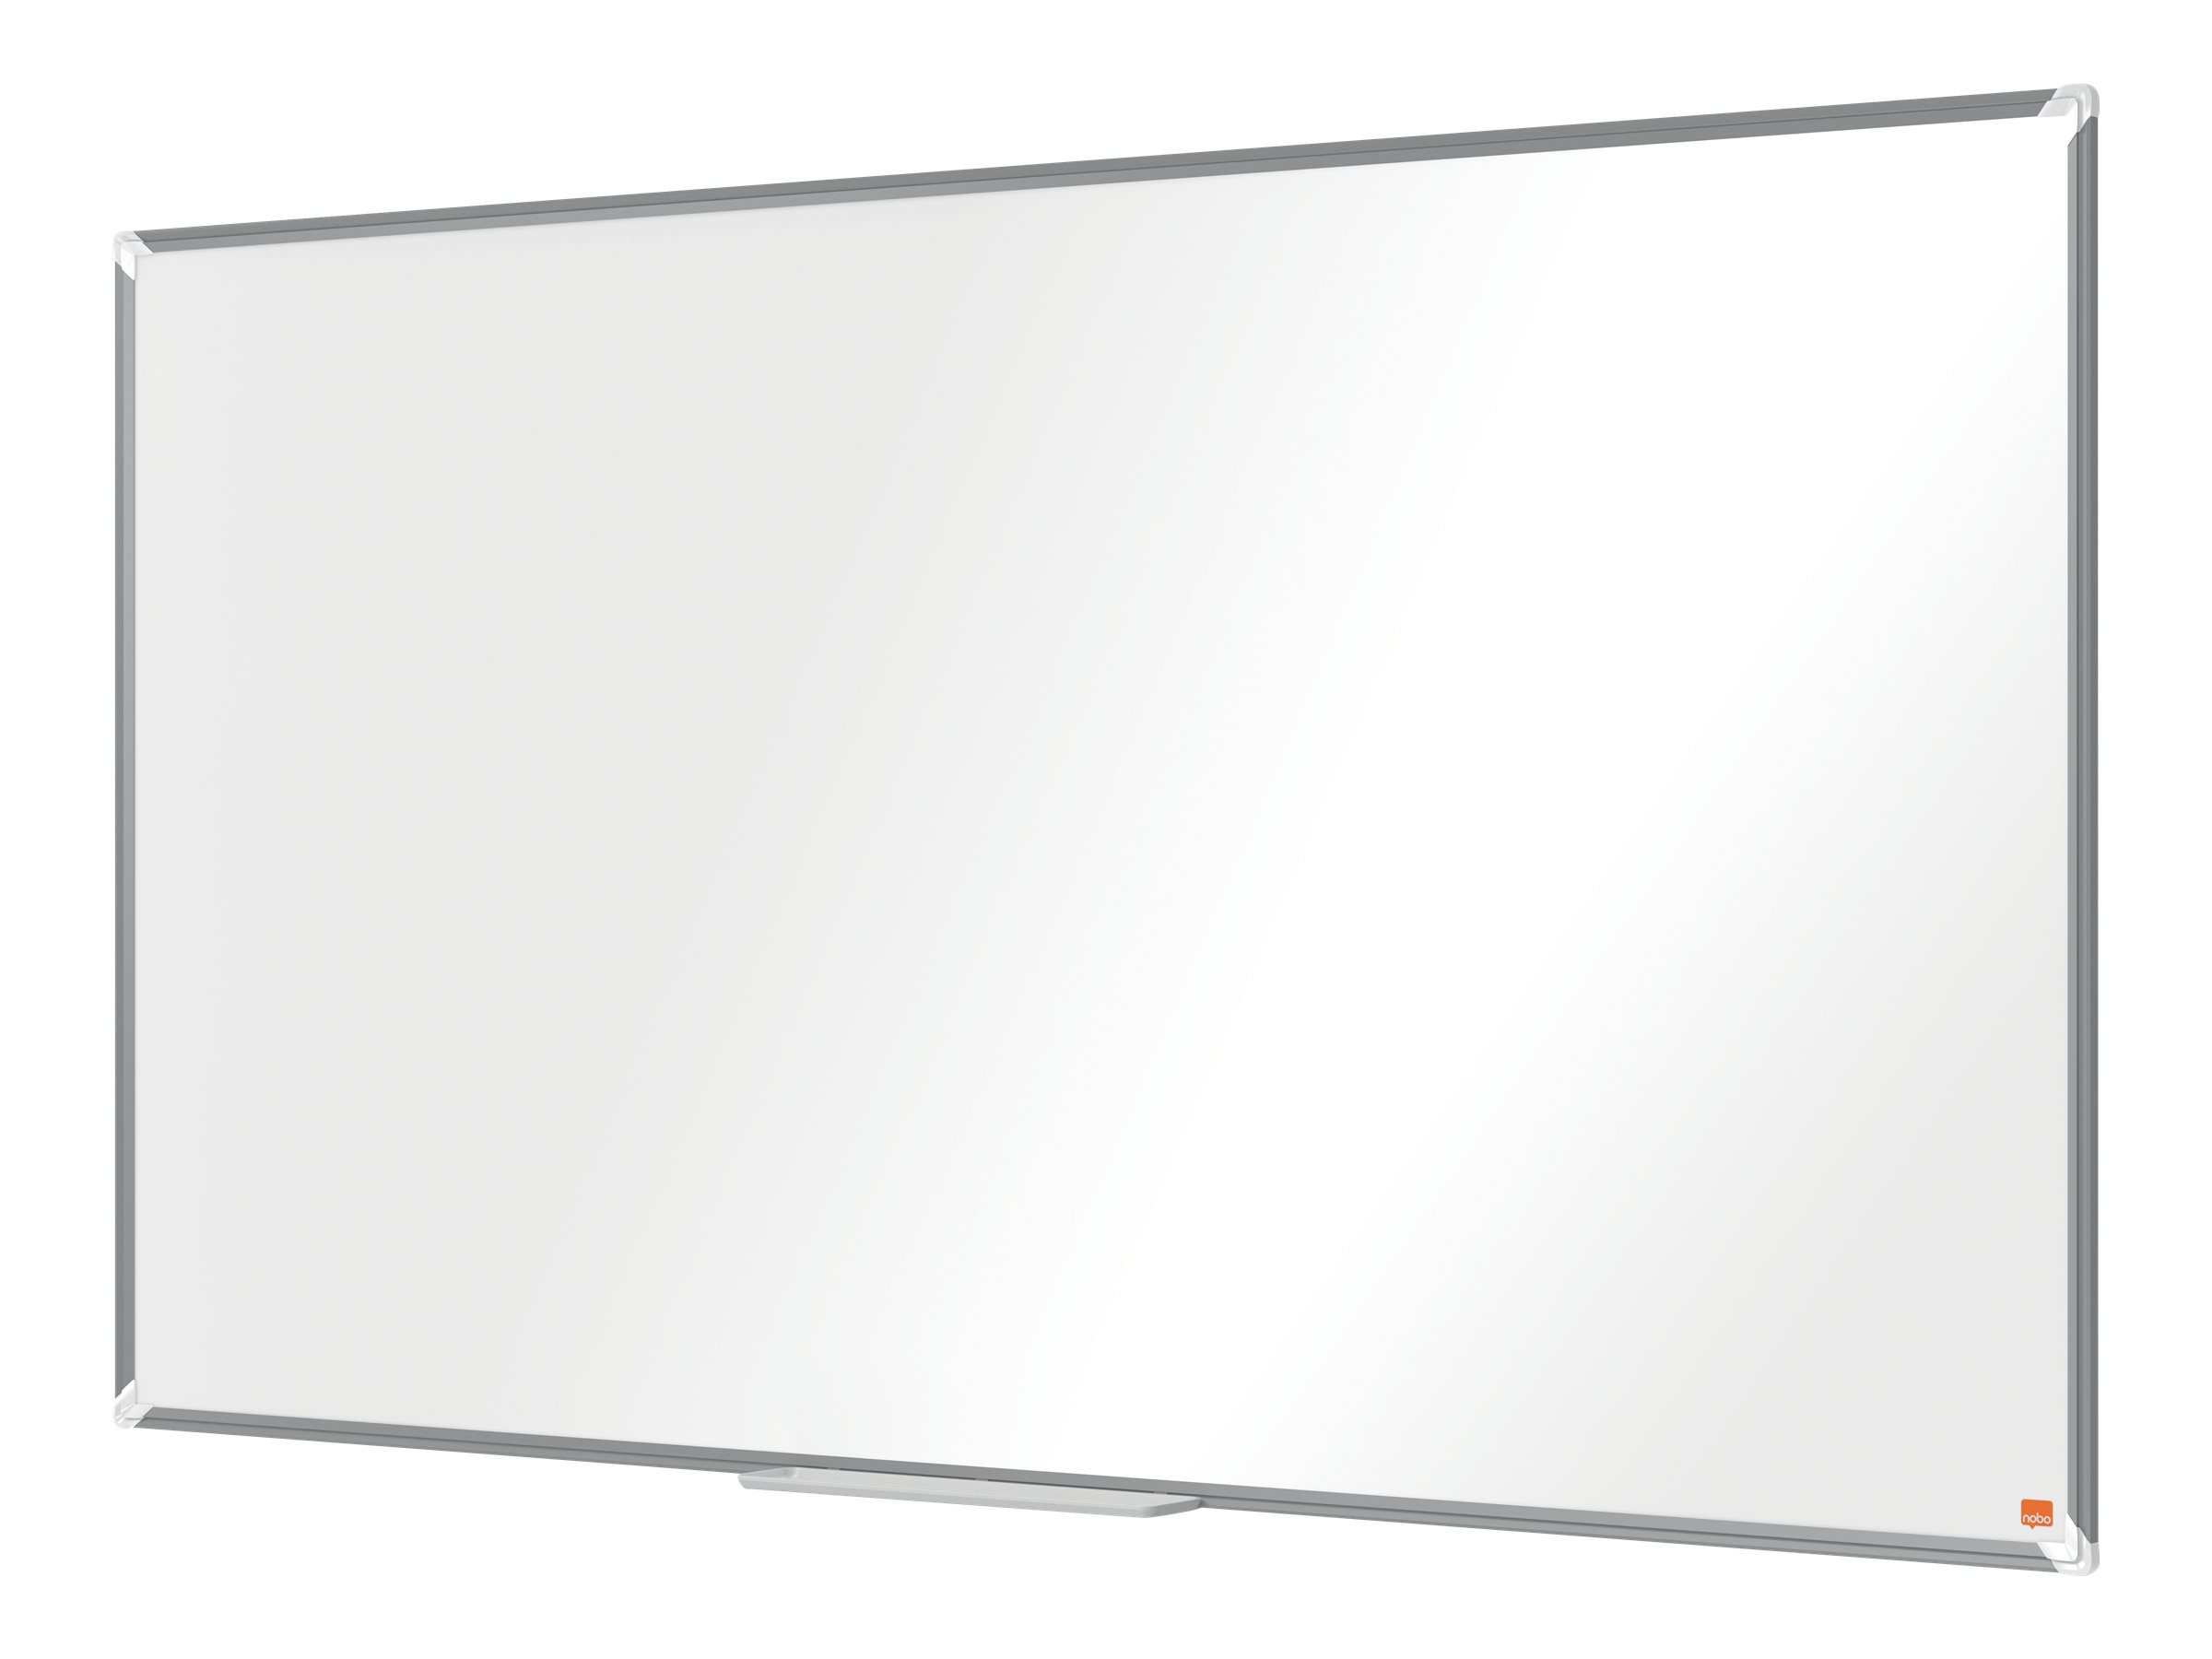 Nobo Premium Plus Widescreen 70